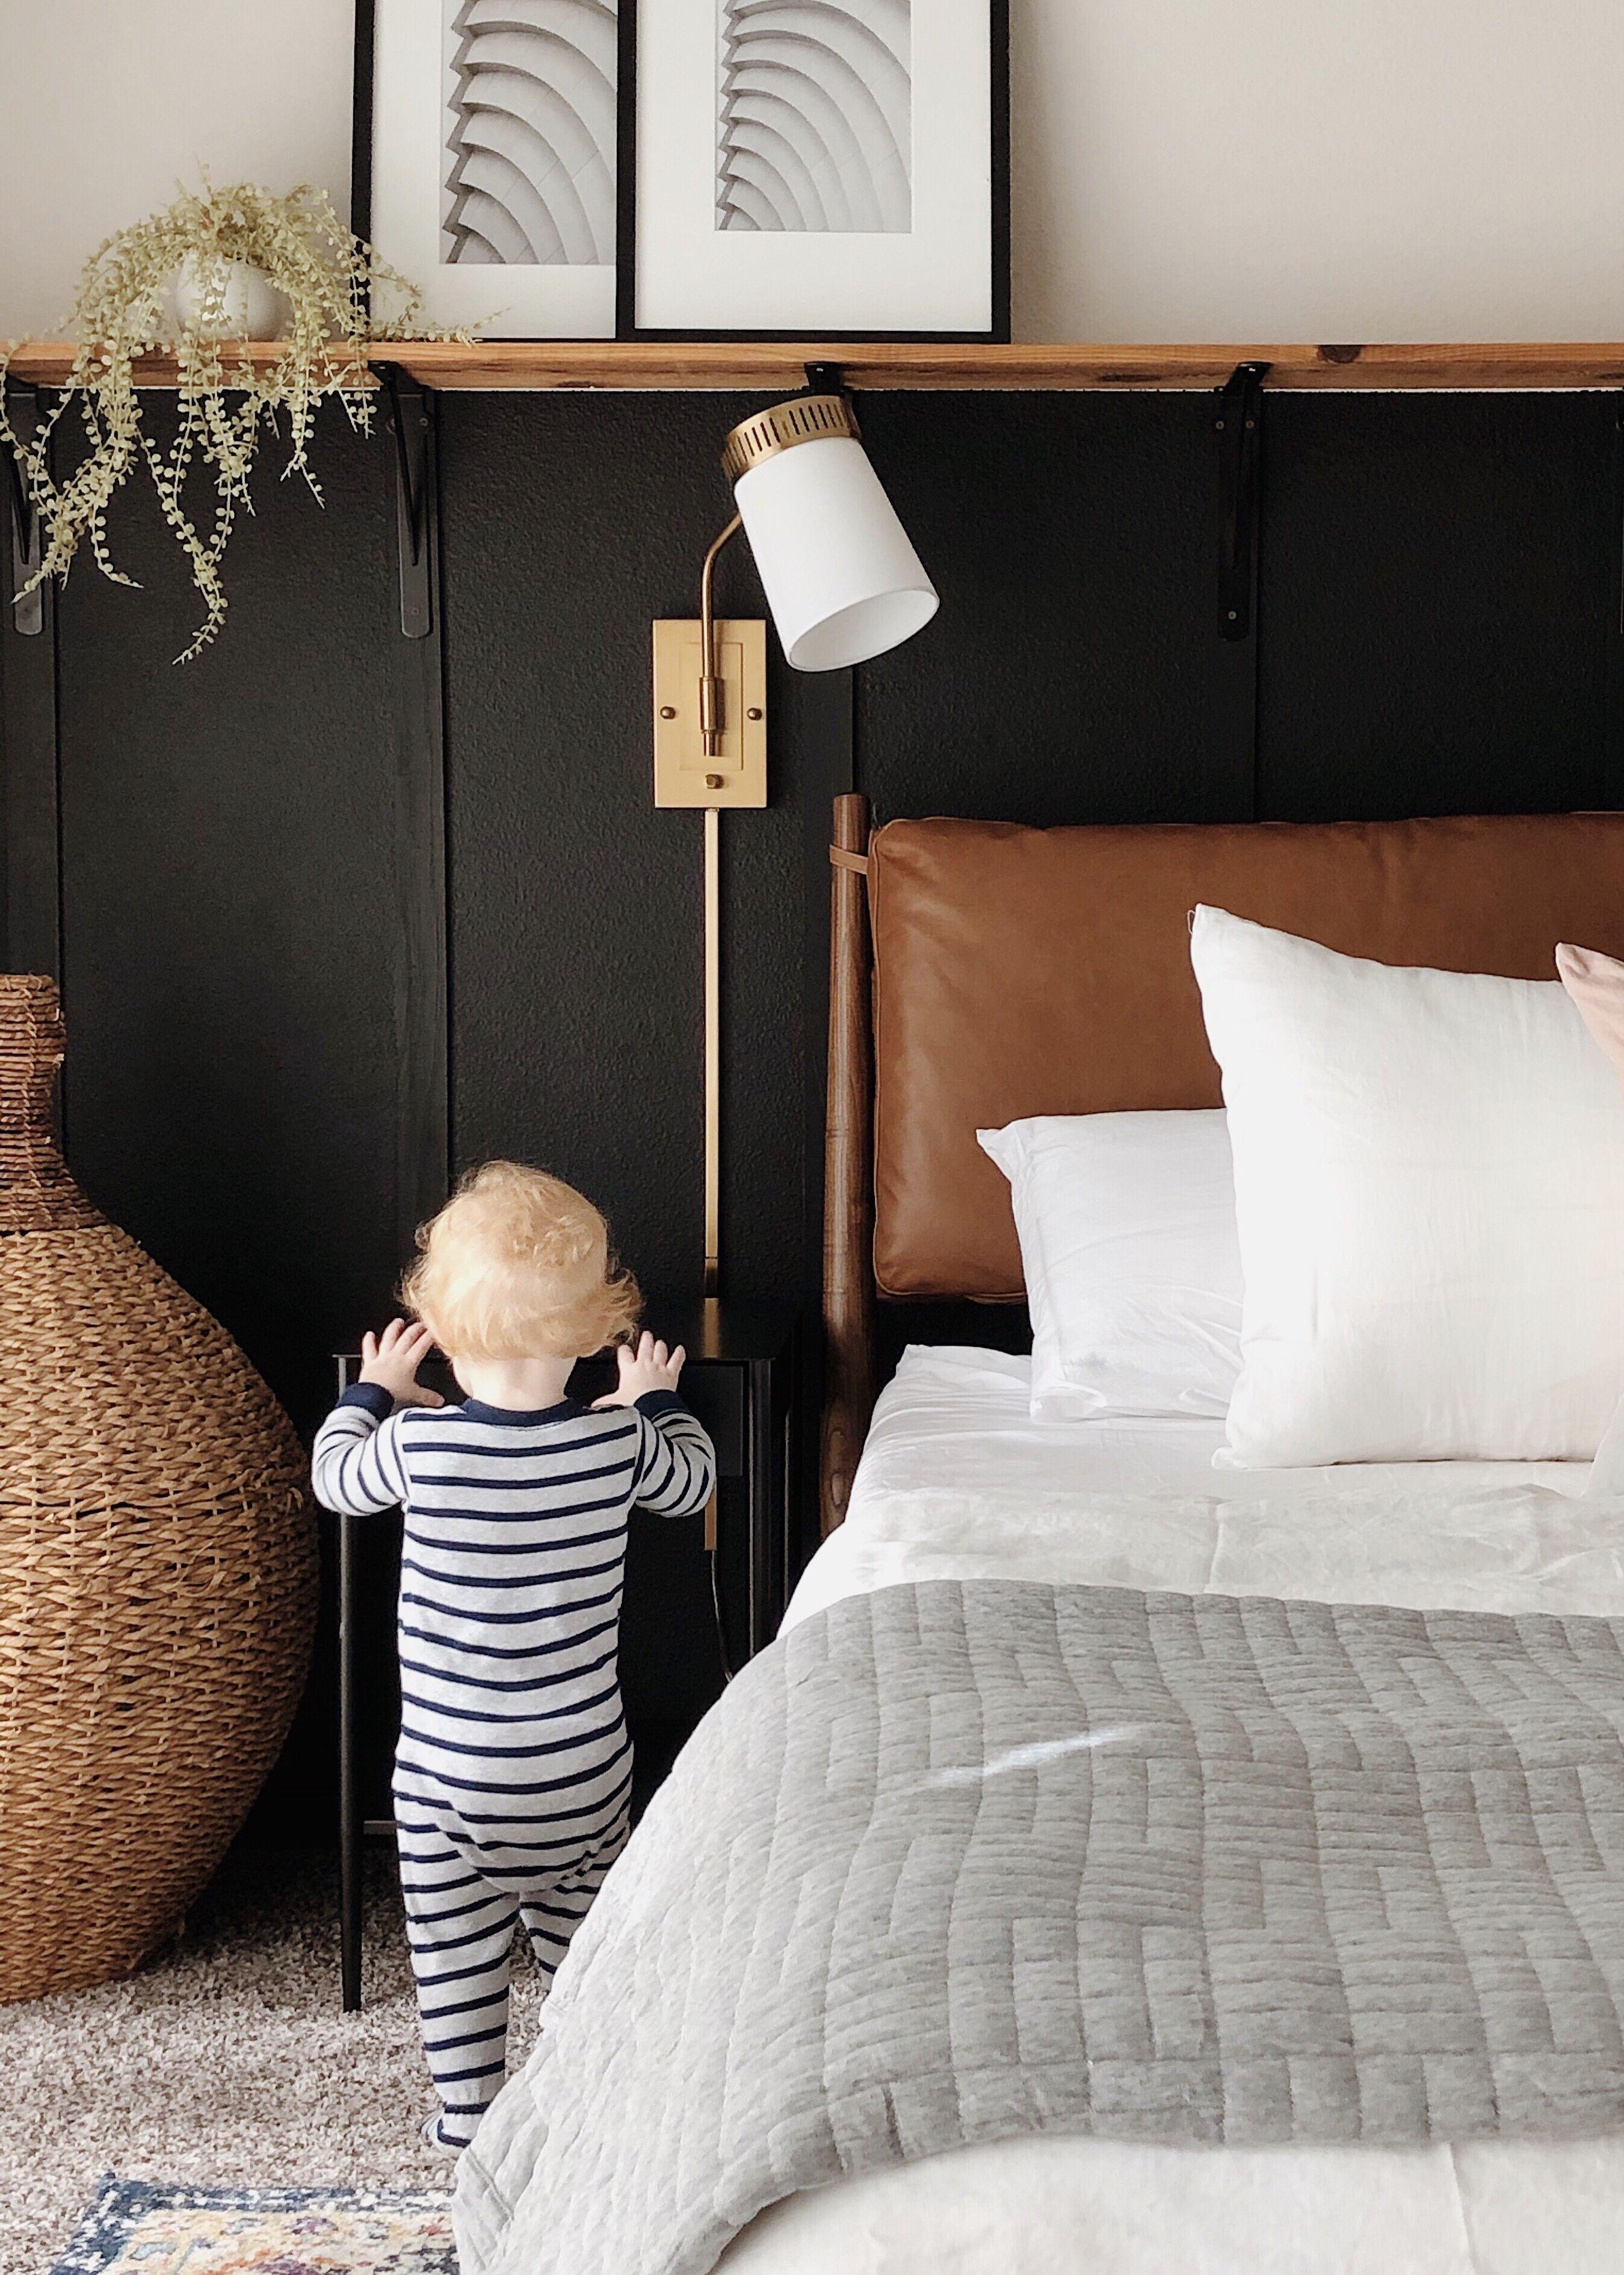 Pretty Olive Instagram Diy Accent Wall Master Bedroom Inspiration Chic Bedroom Design Bedroom Interior